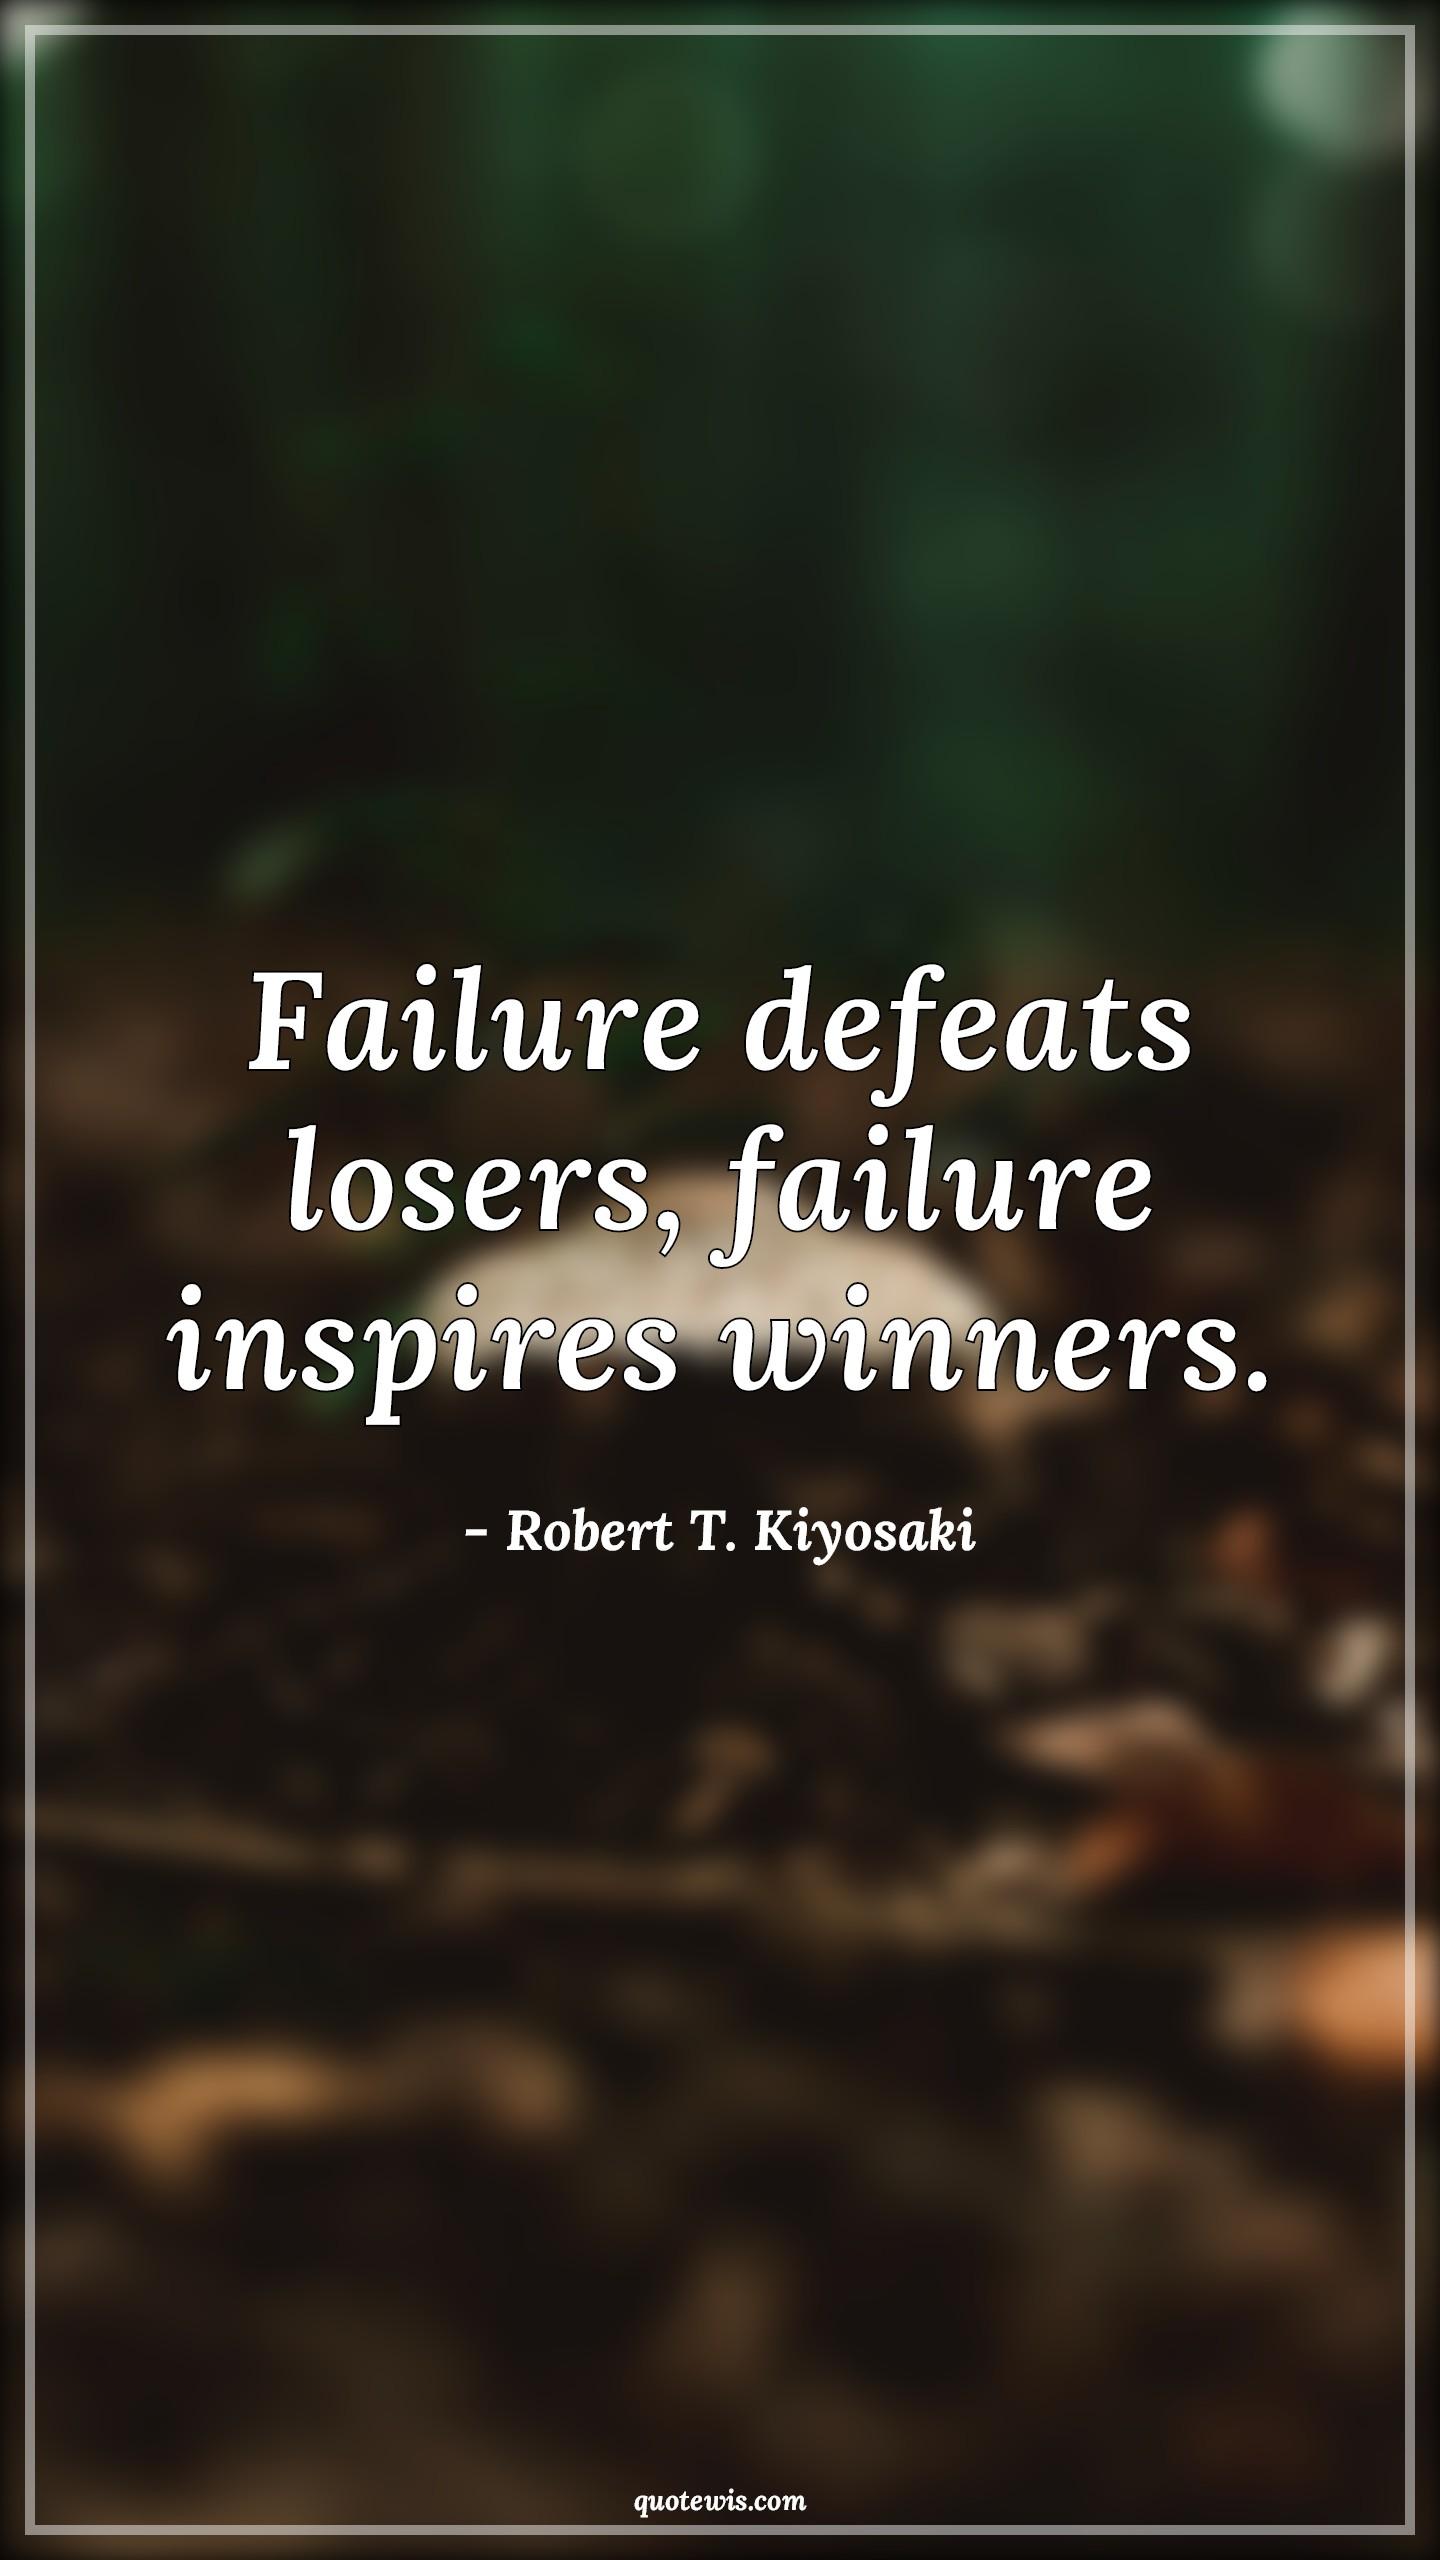 Failure defeats losers, failure inspires winners.